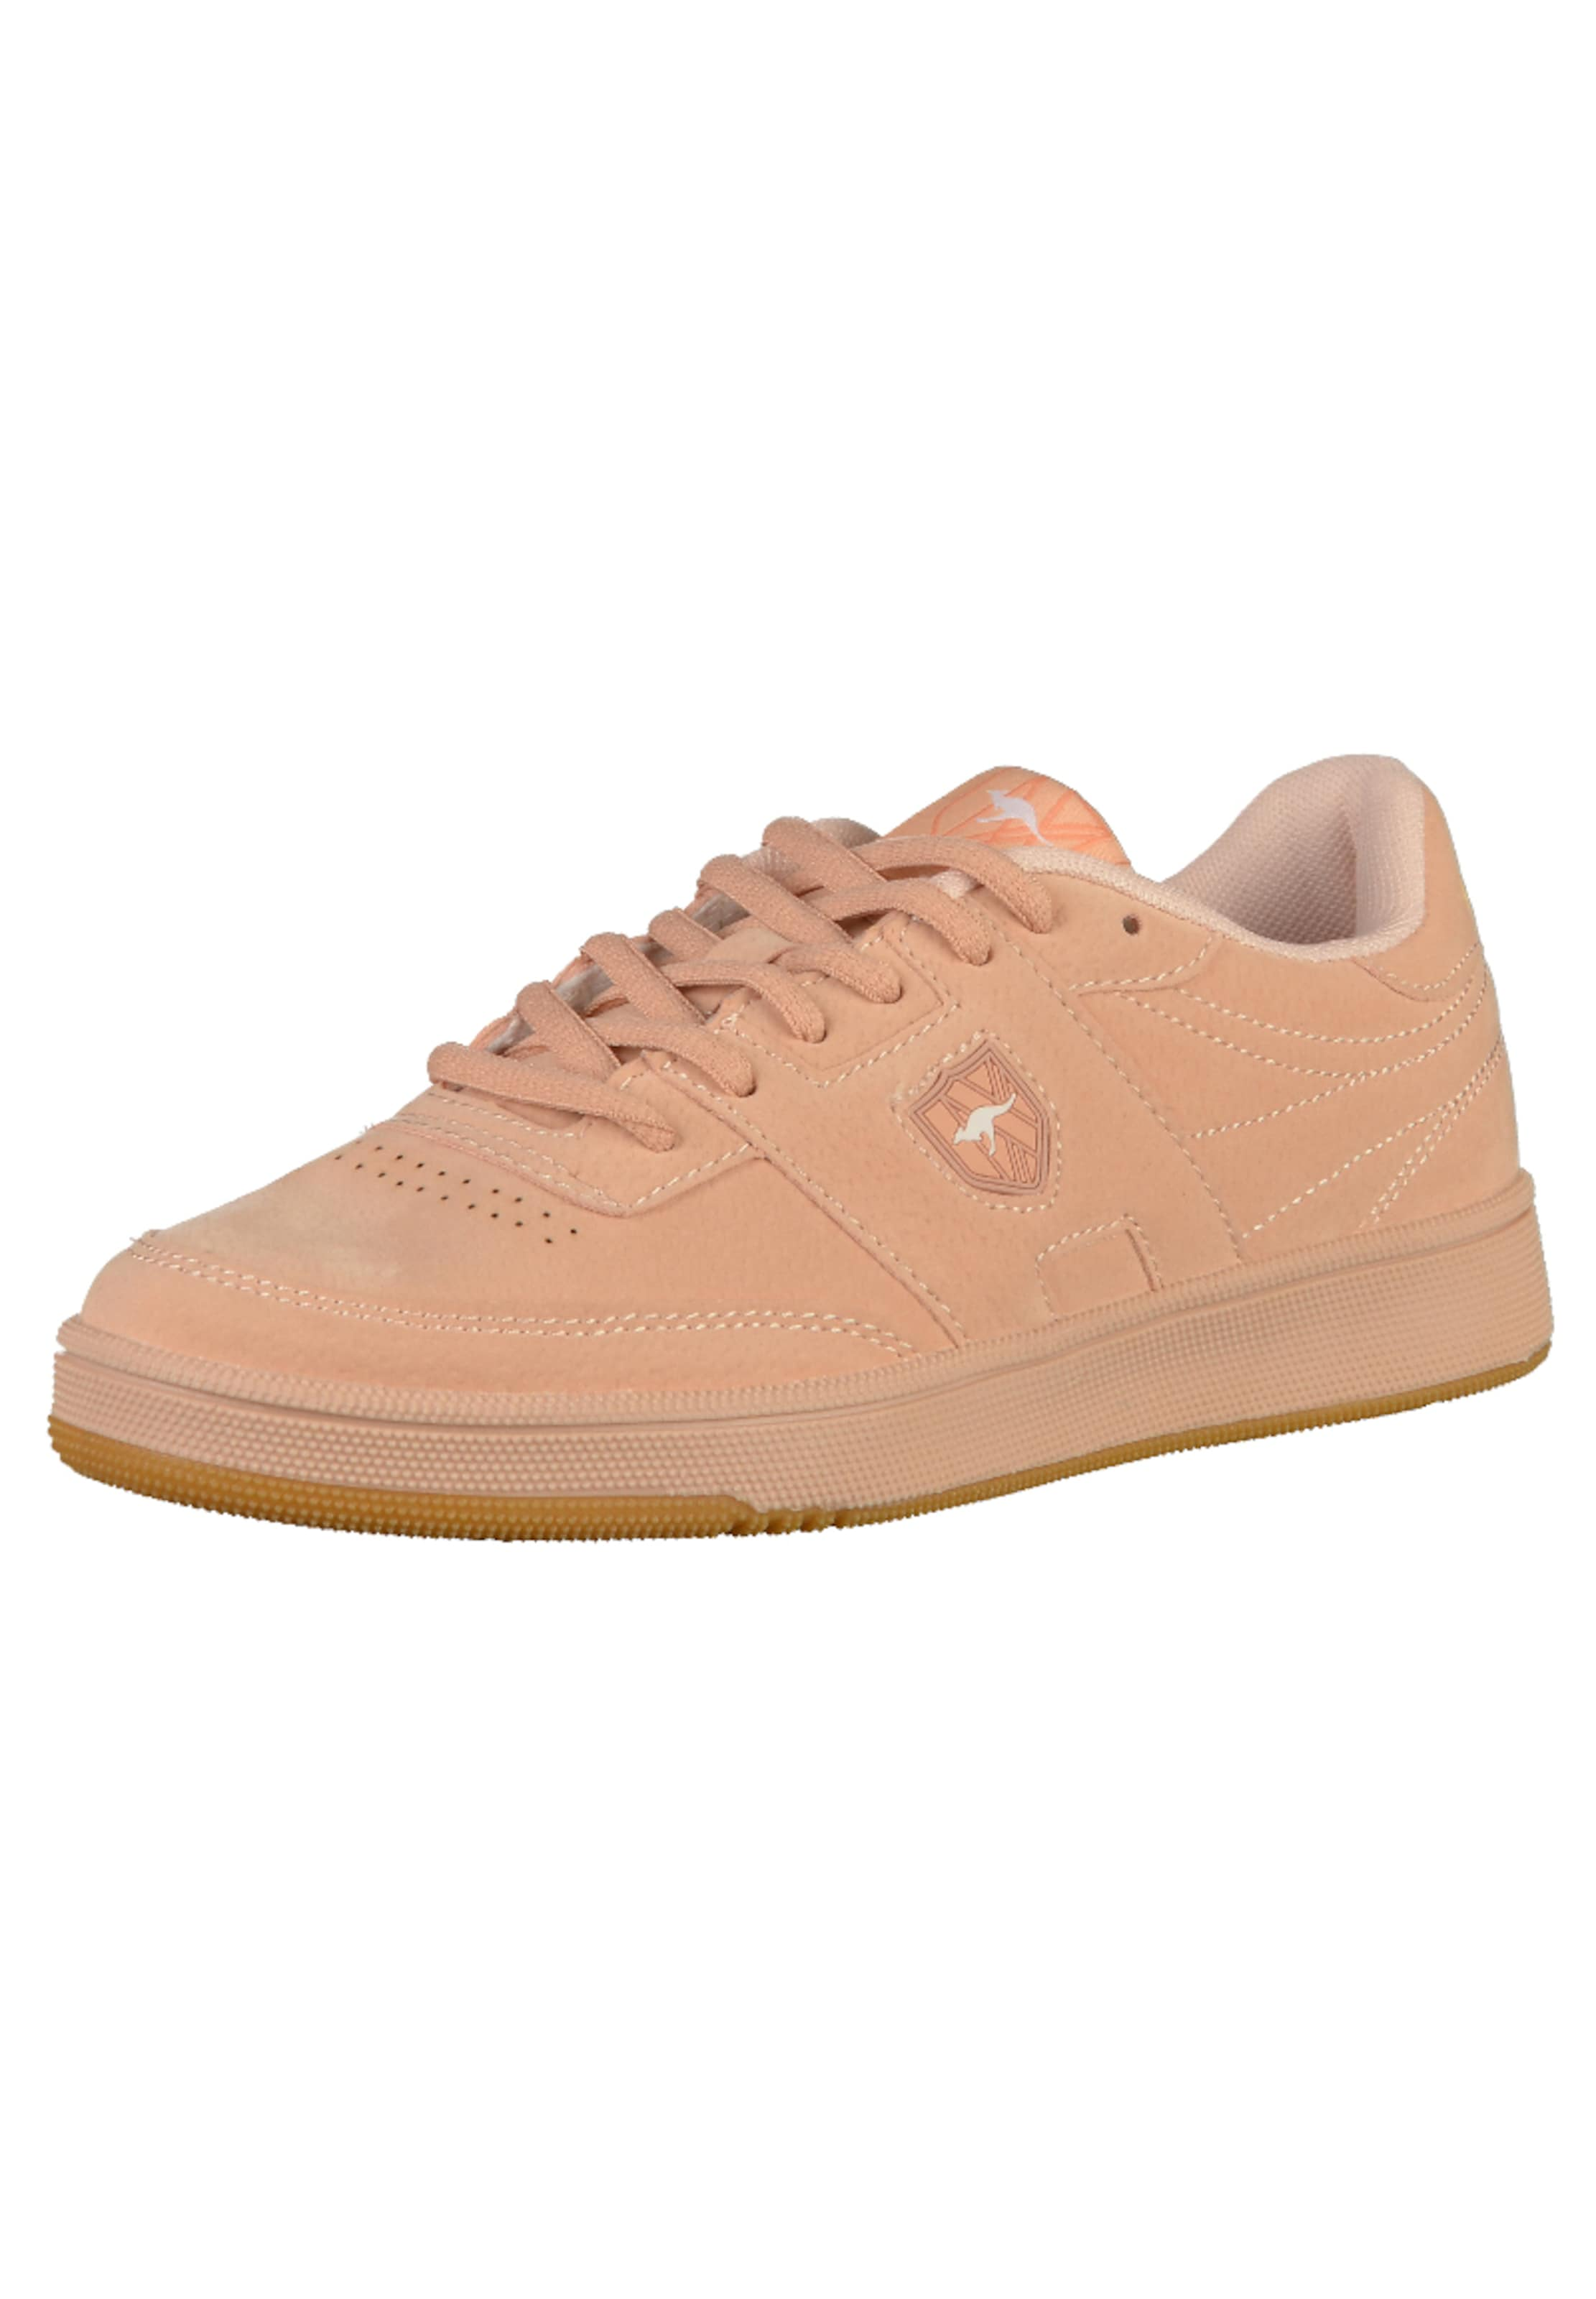 KangaROOS Sneaker Verschleißfeste billige Schuhe Hohe Qualität